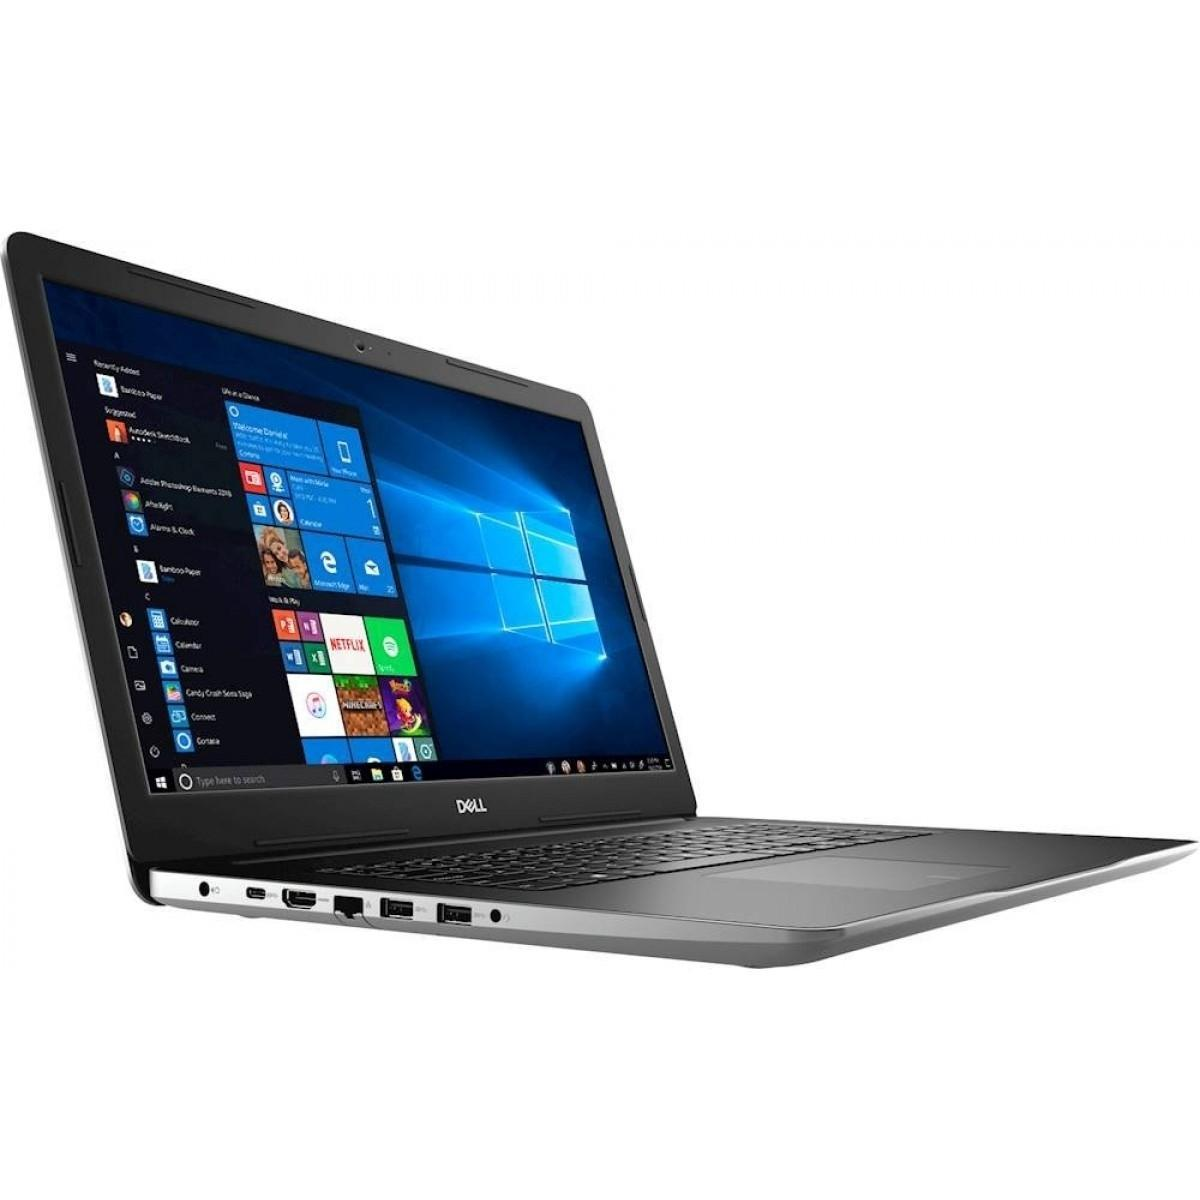 Dell Inspiron 3793 17.3-inch (2019) - Core i7-1065G7 - 16 GB  - SSD 256 GB + HDD 2 TB